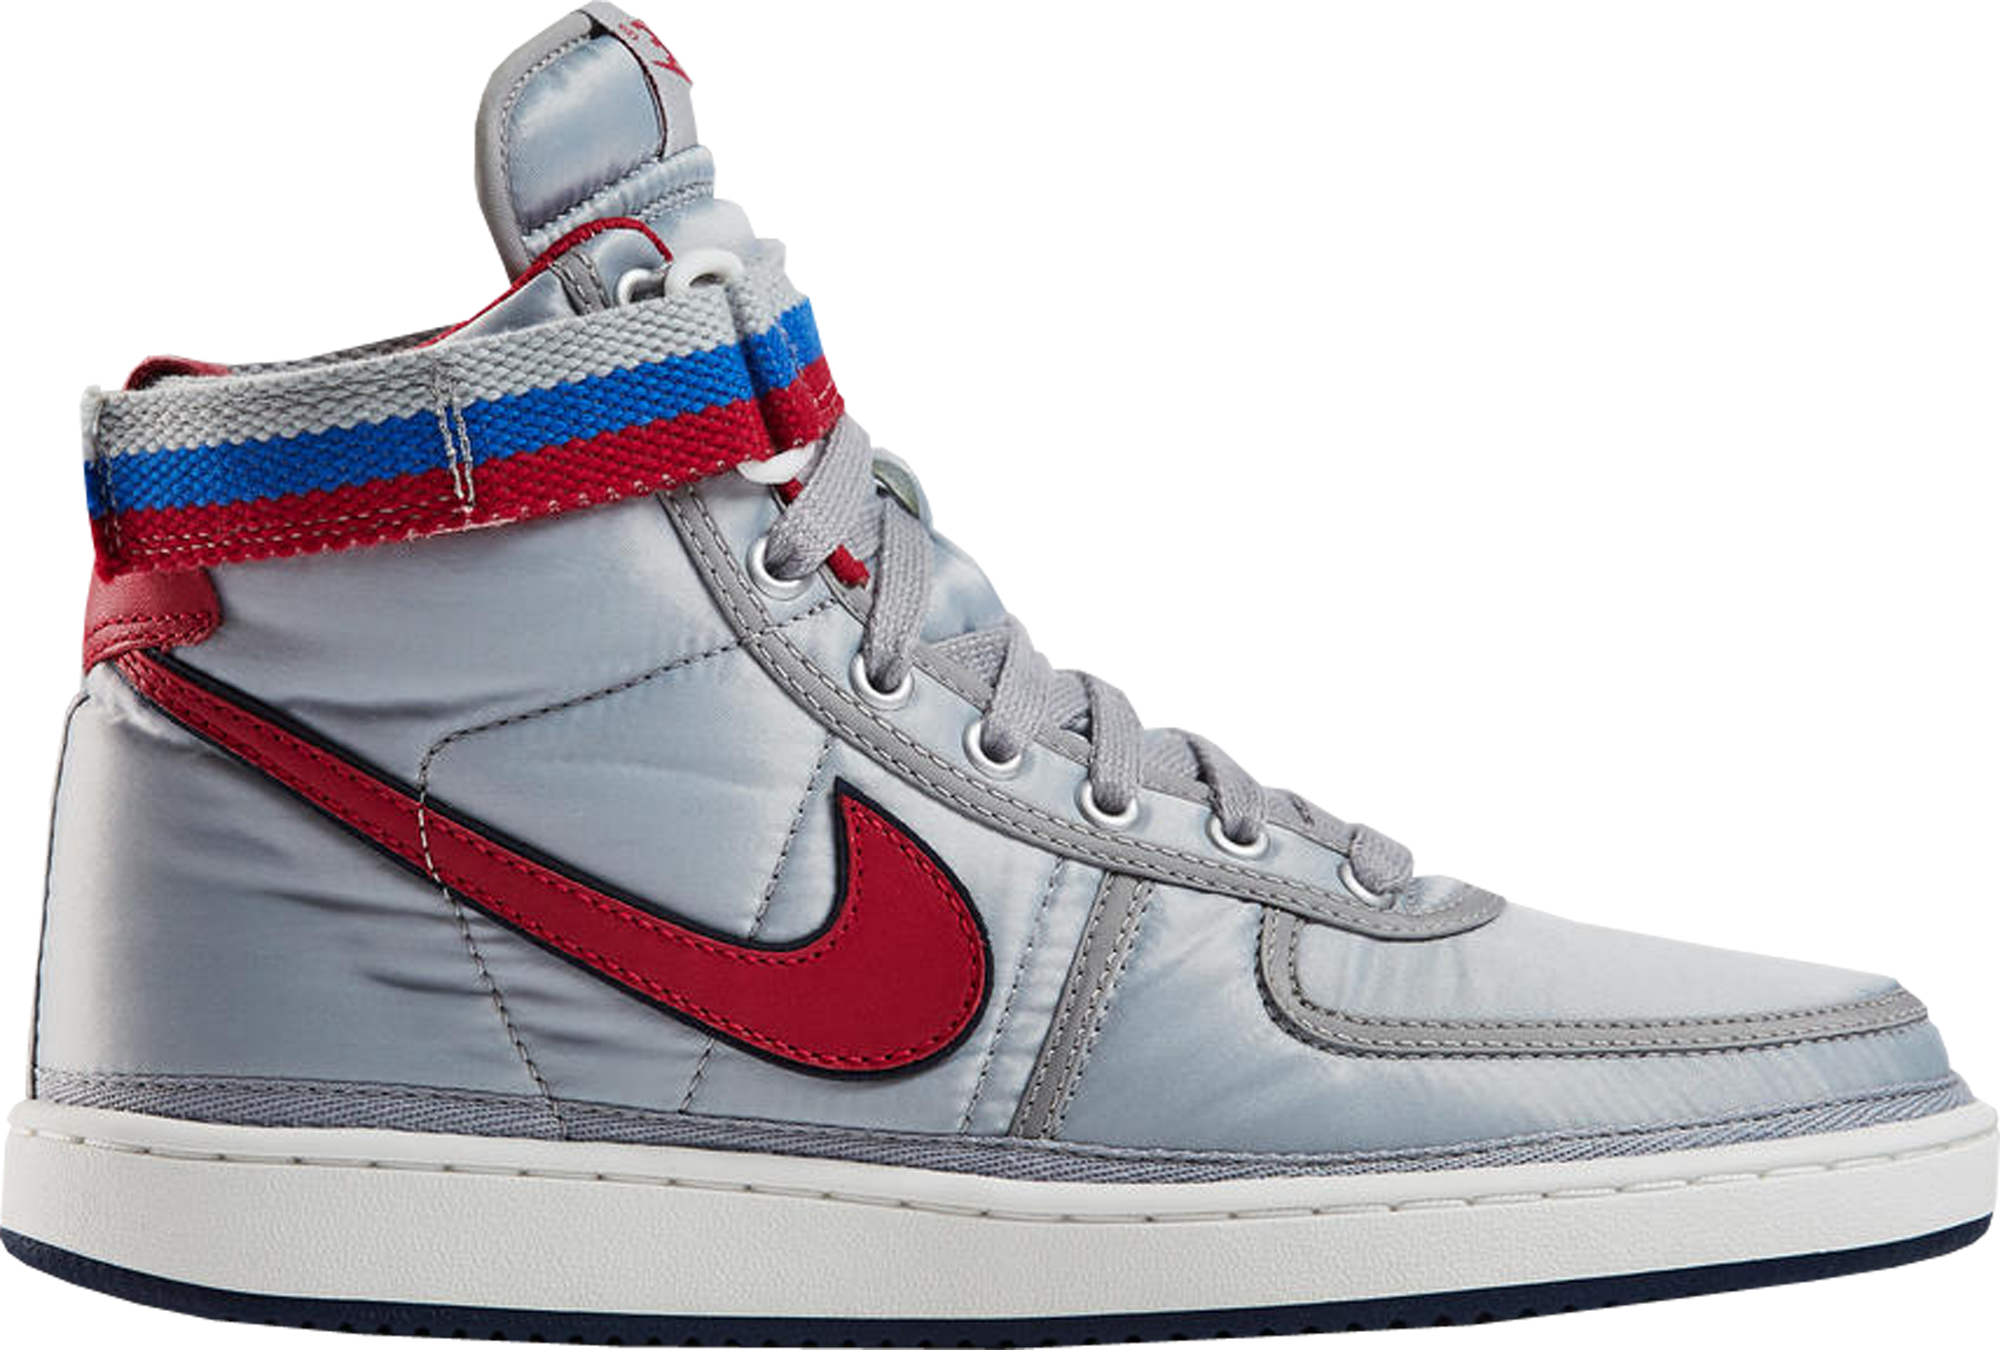 Nike Vandal High Supreme Nylon OG (2017)